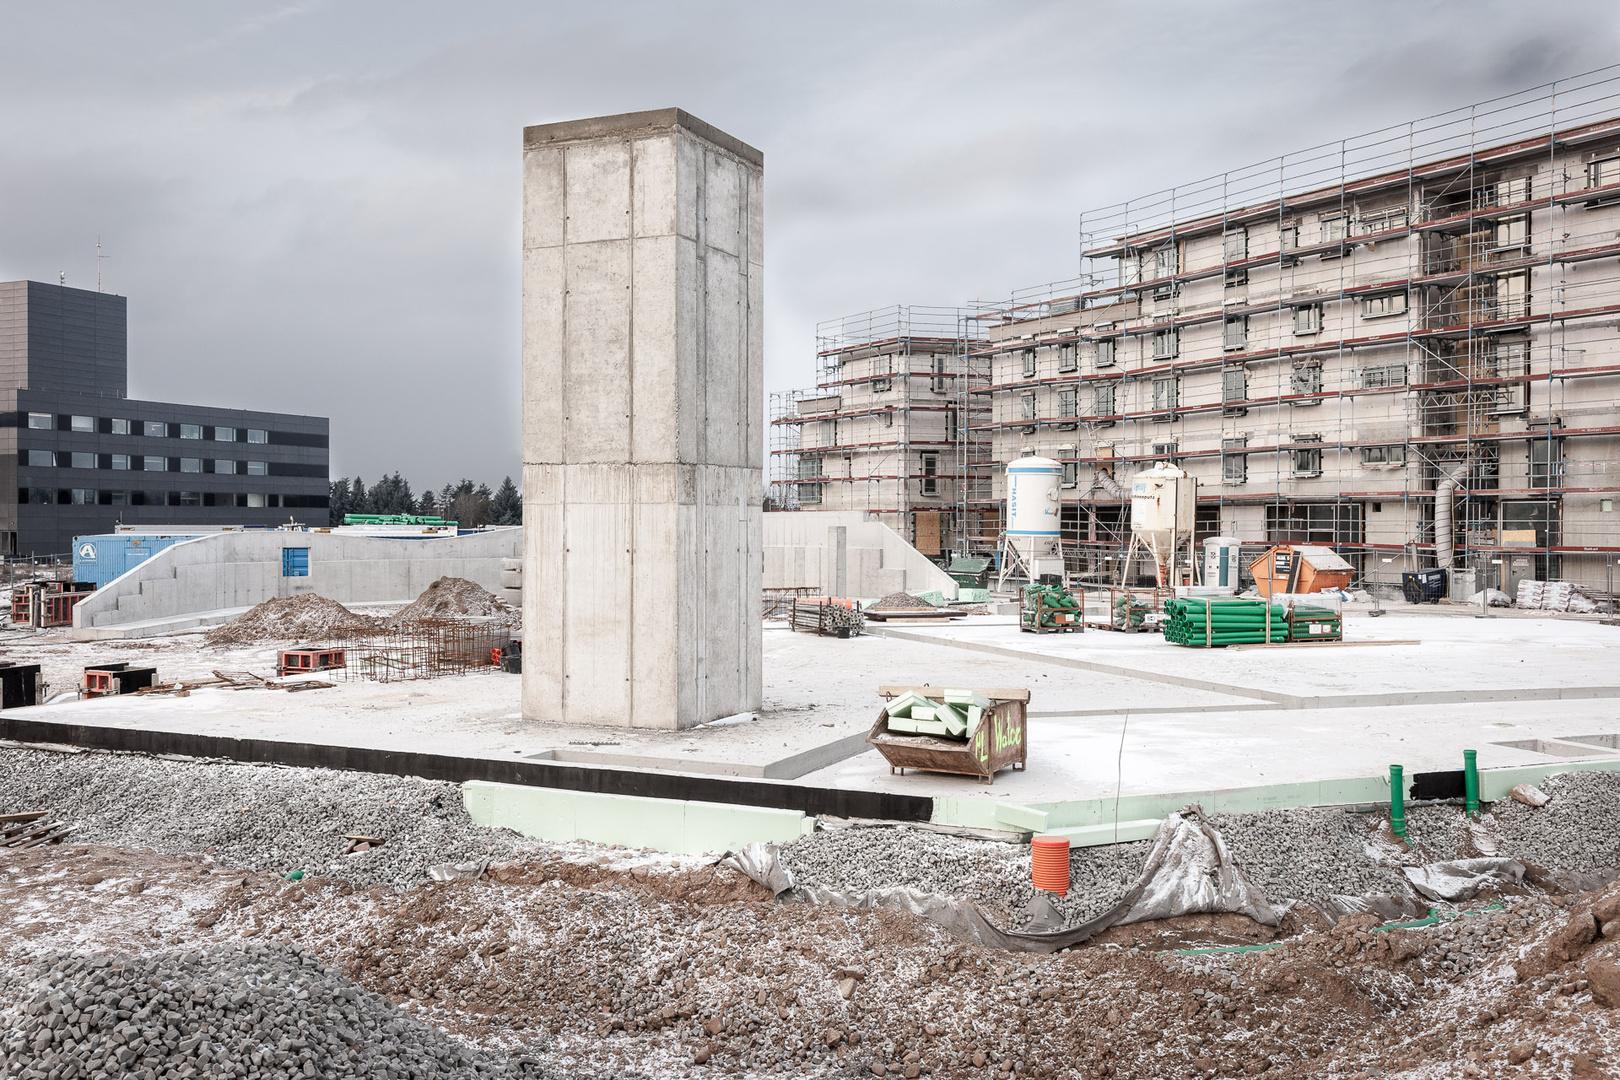 Bahnstadt_08-02-2012-2.jpg